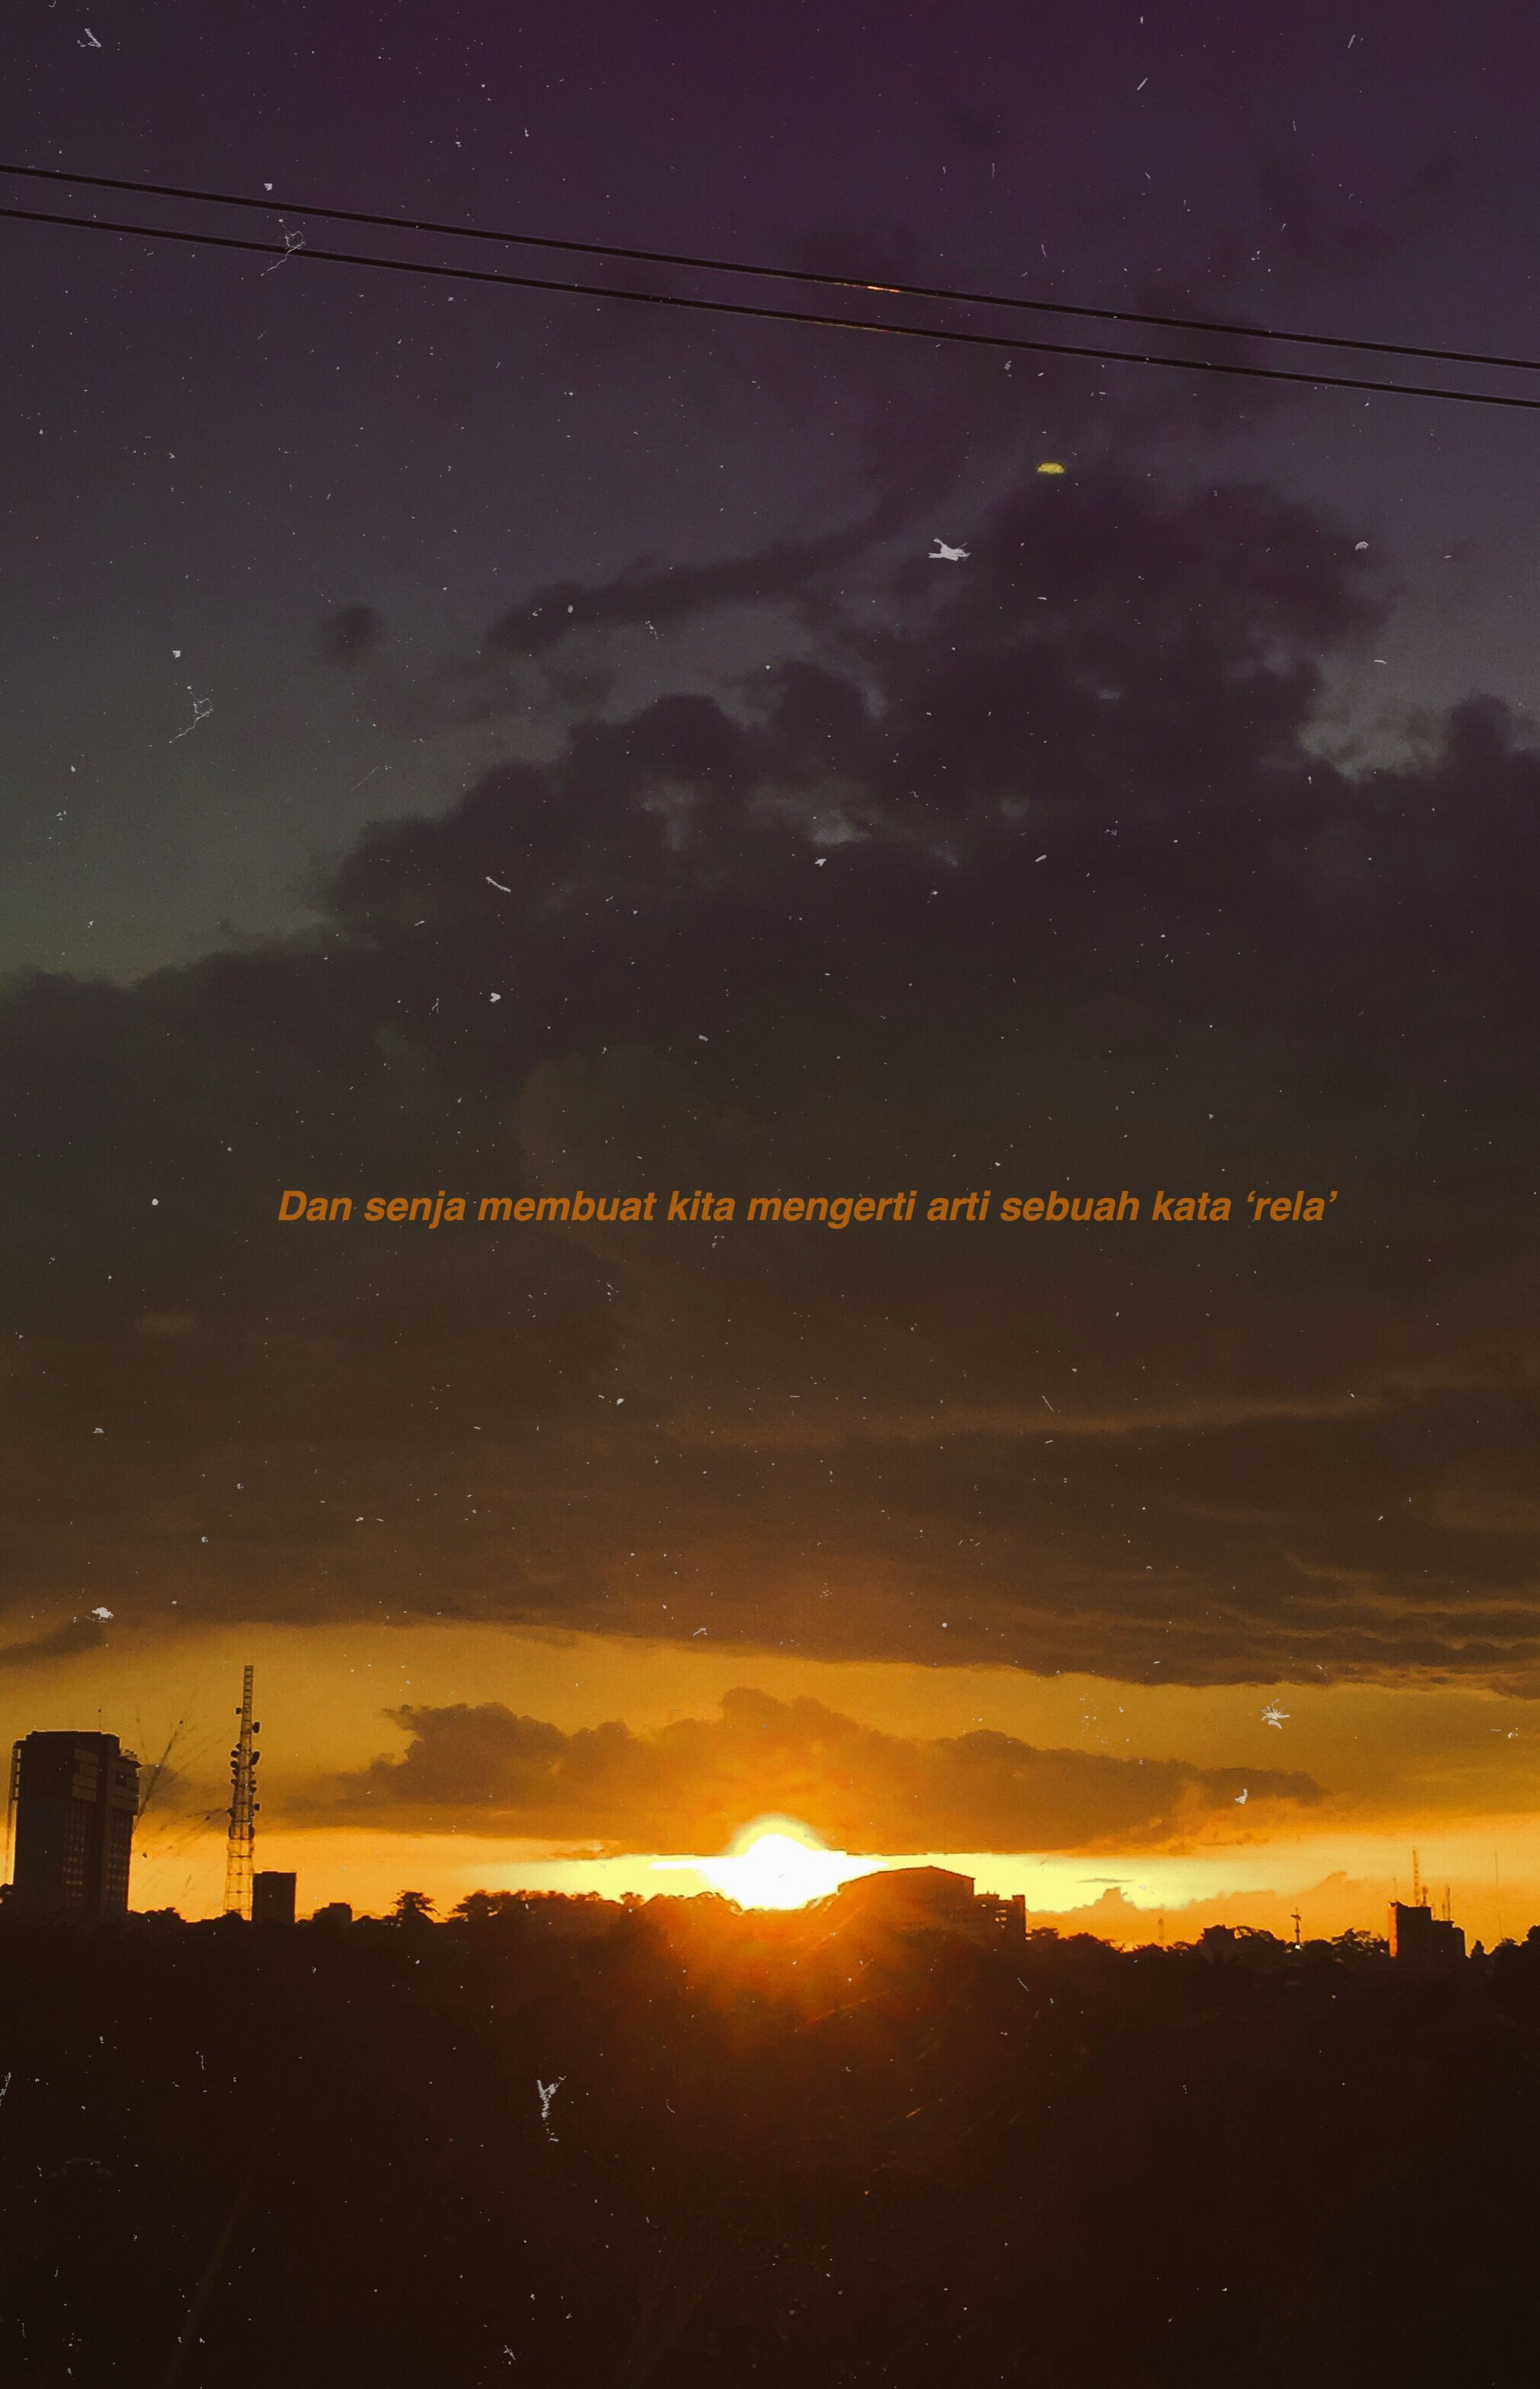 Pin Oleh Elin Mayang Di Senja Quotes Dengan Gambar Kutipan